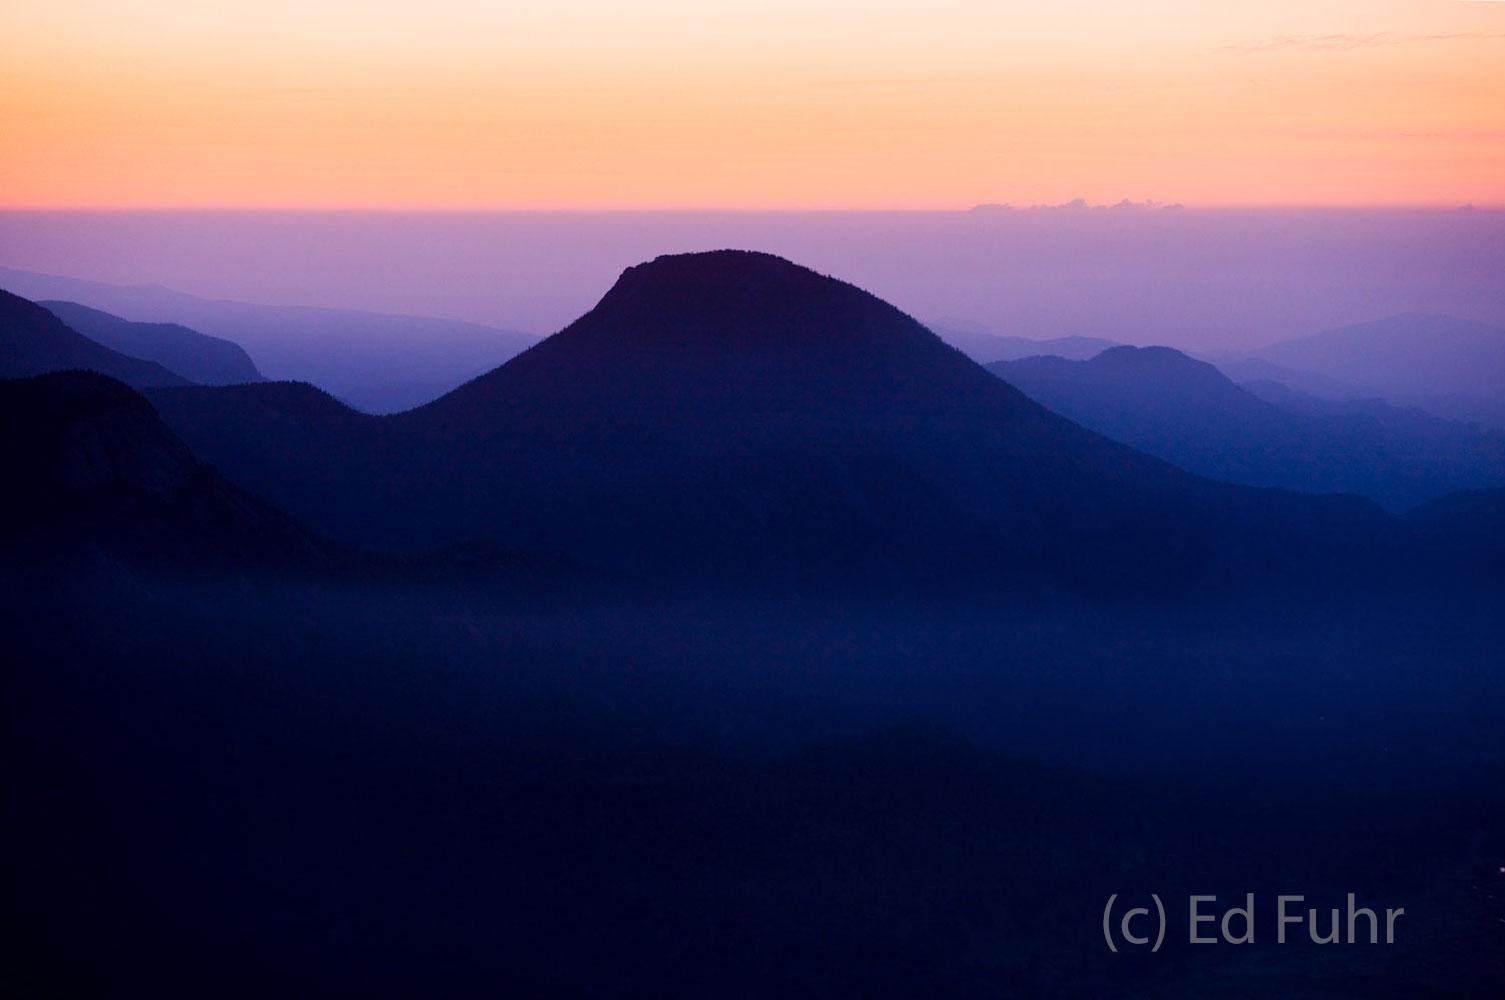 sunrise, rmnp, photo